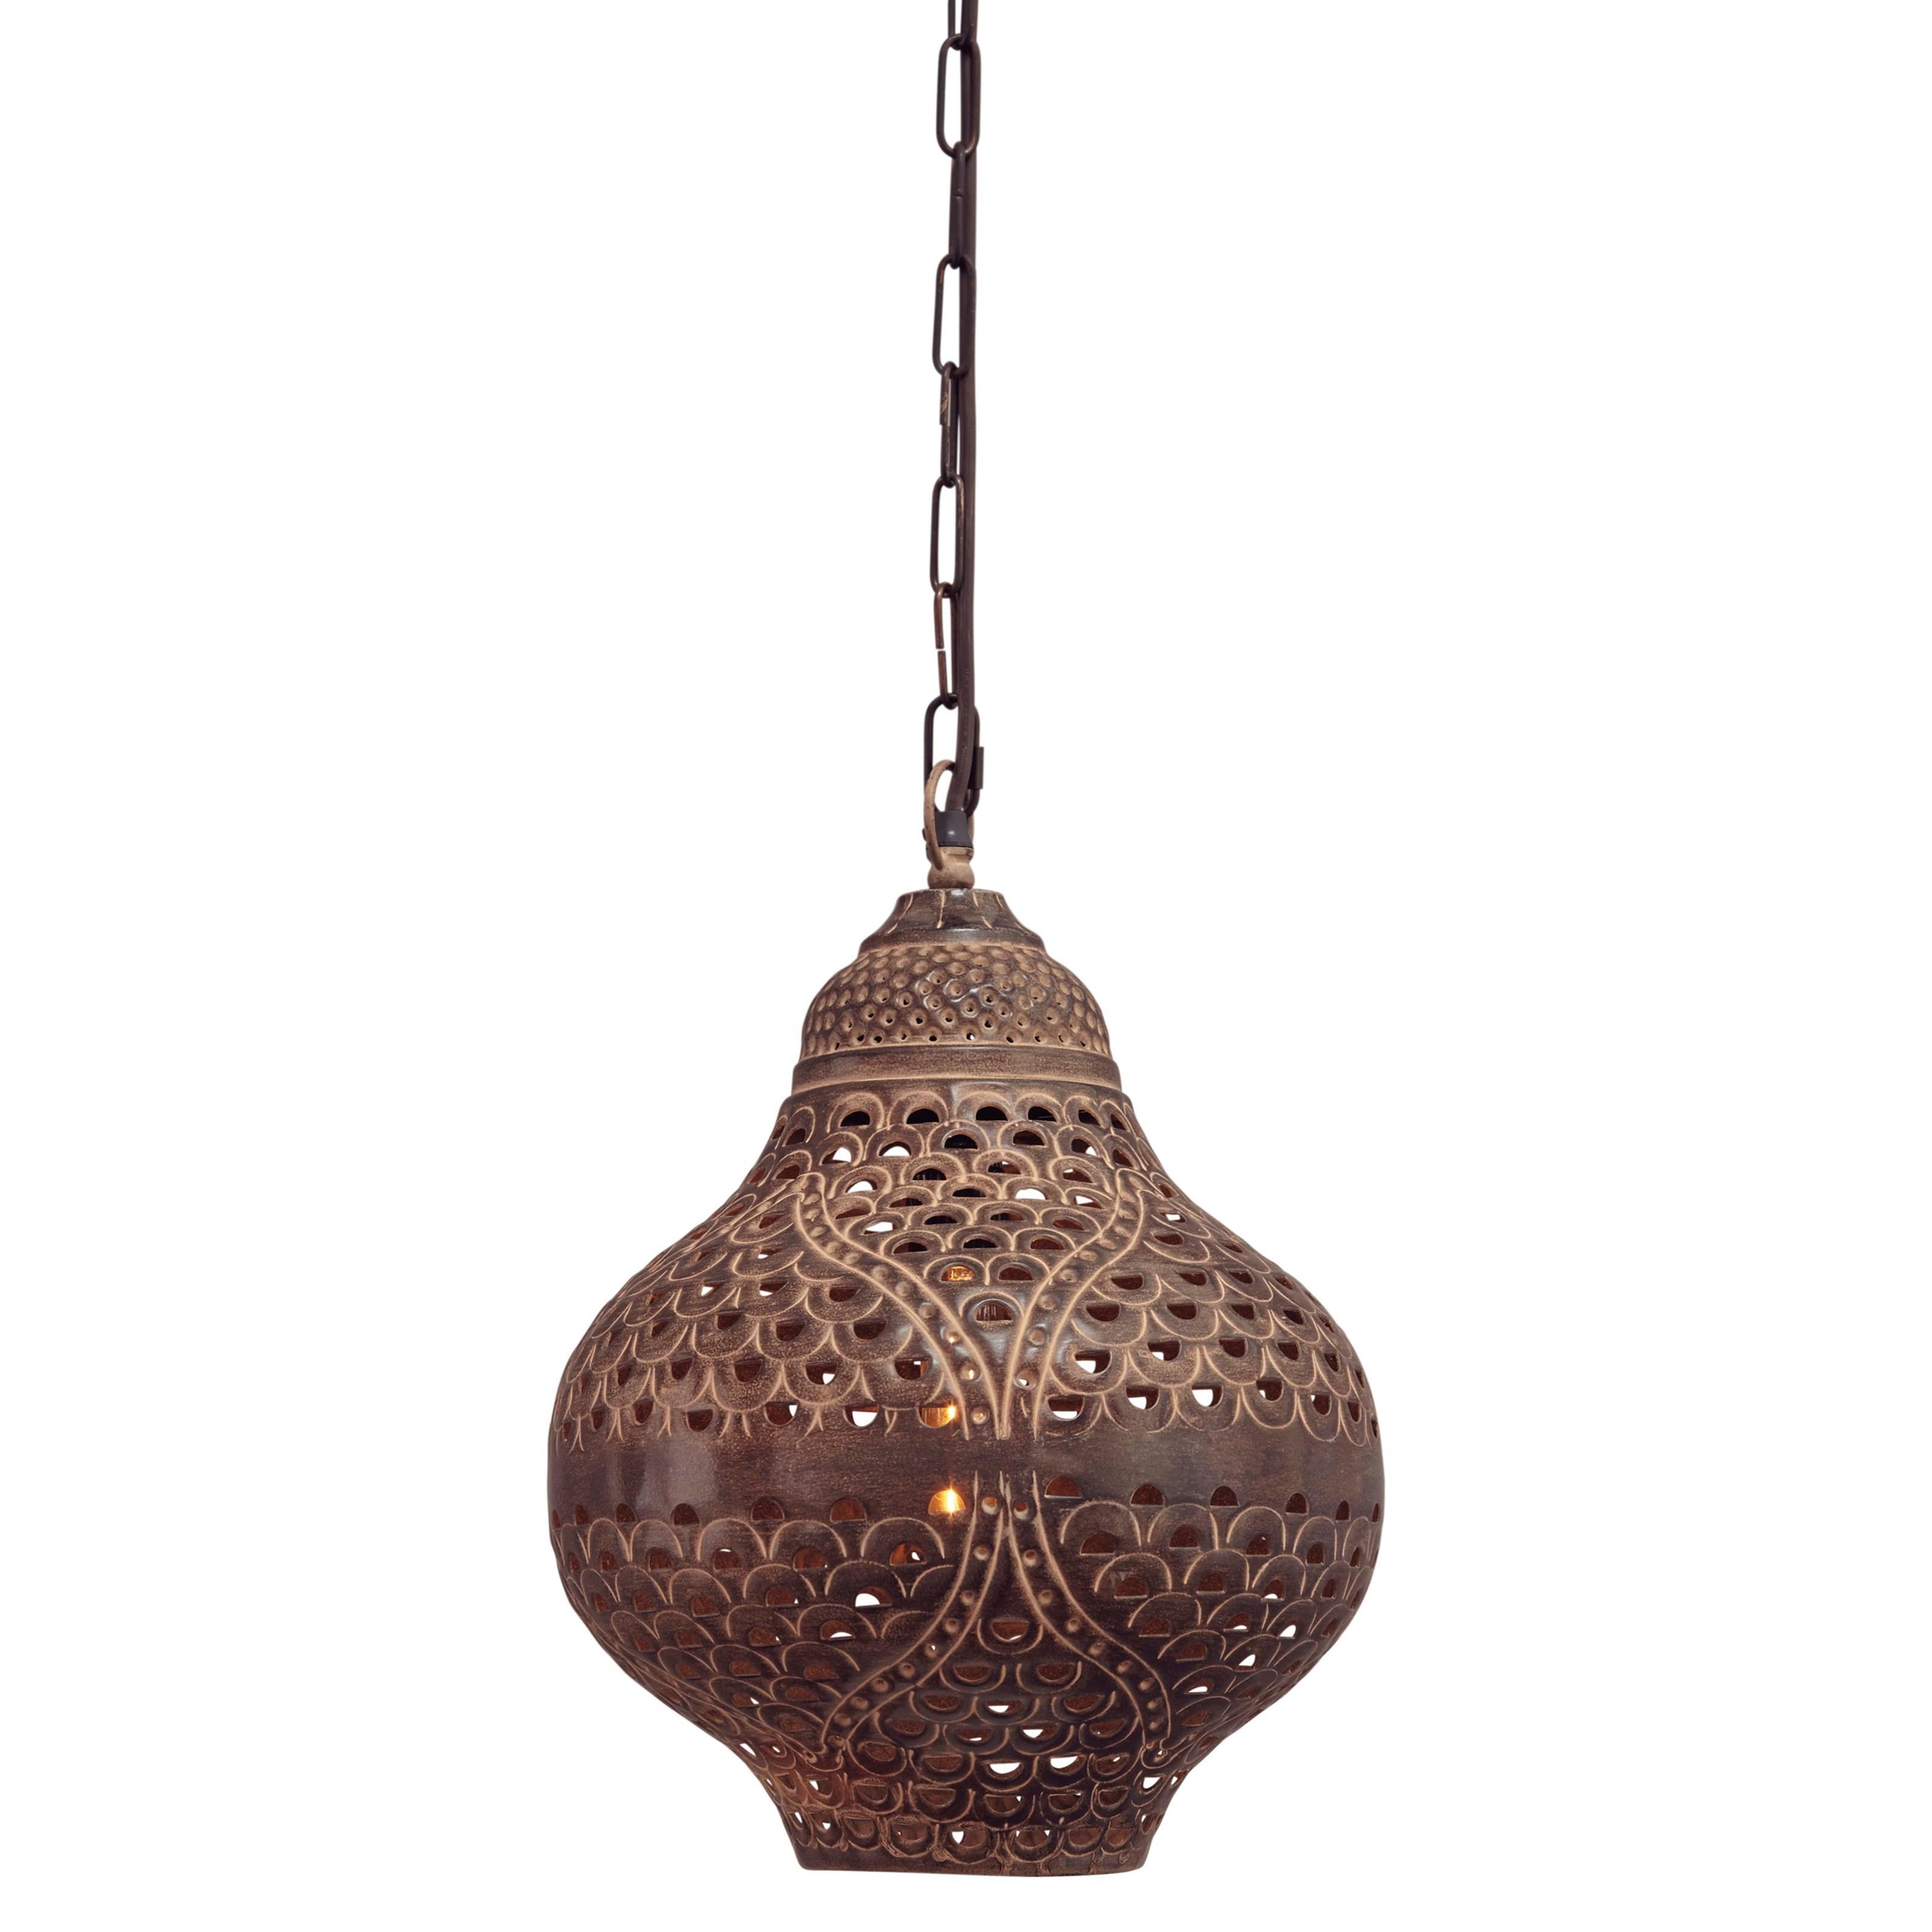 Signature Design by Ashley Pendant Lights Jonelle Antique Brown Metal Pendant Light - Item Number: L000628